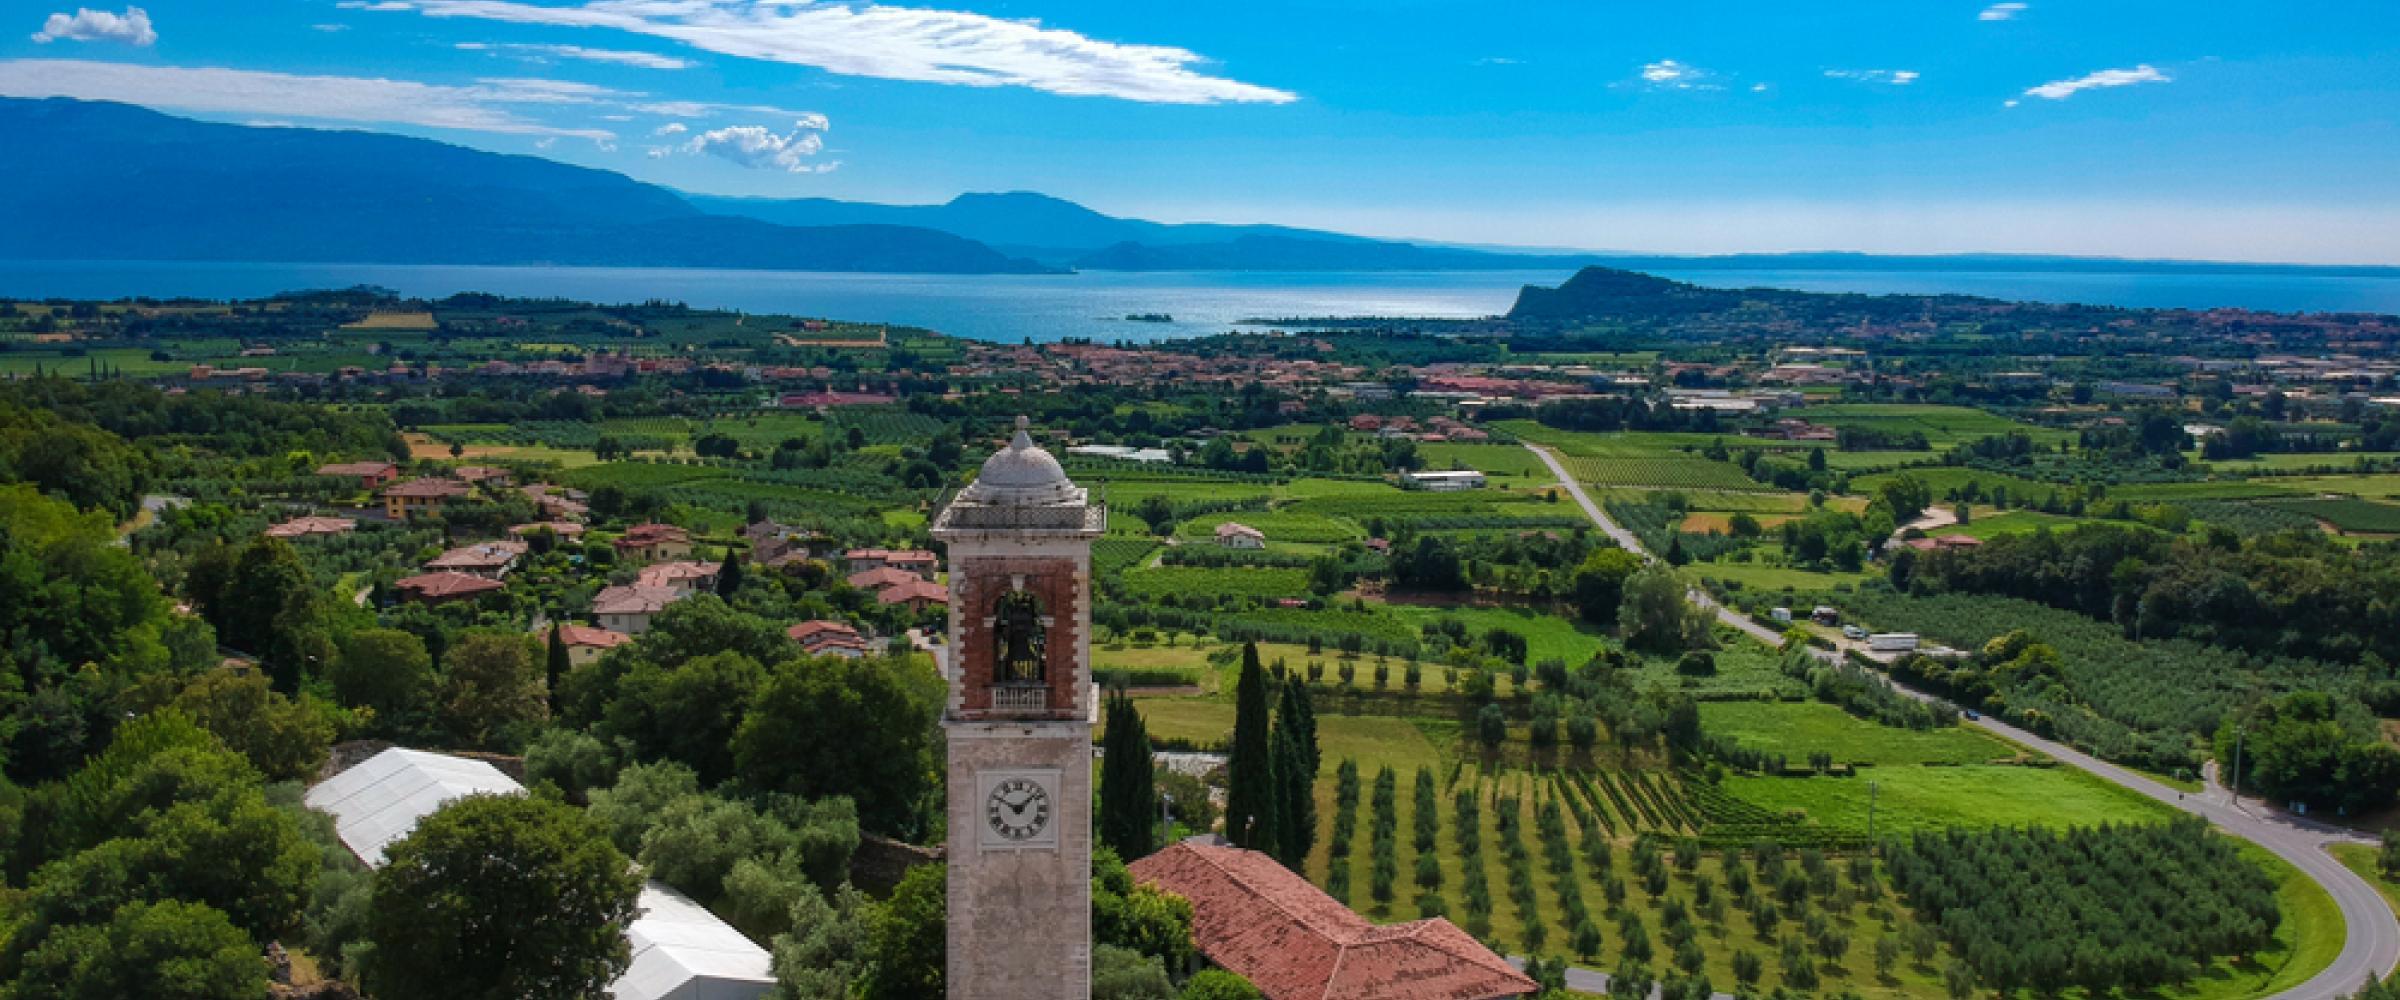 Week end romantico sul lago di Garda: ispirazioni ed idee